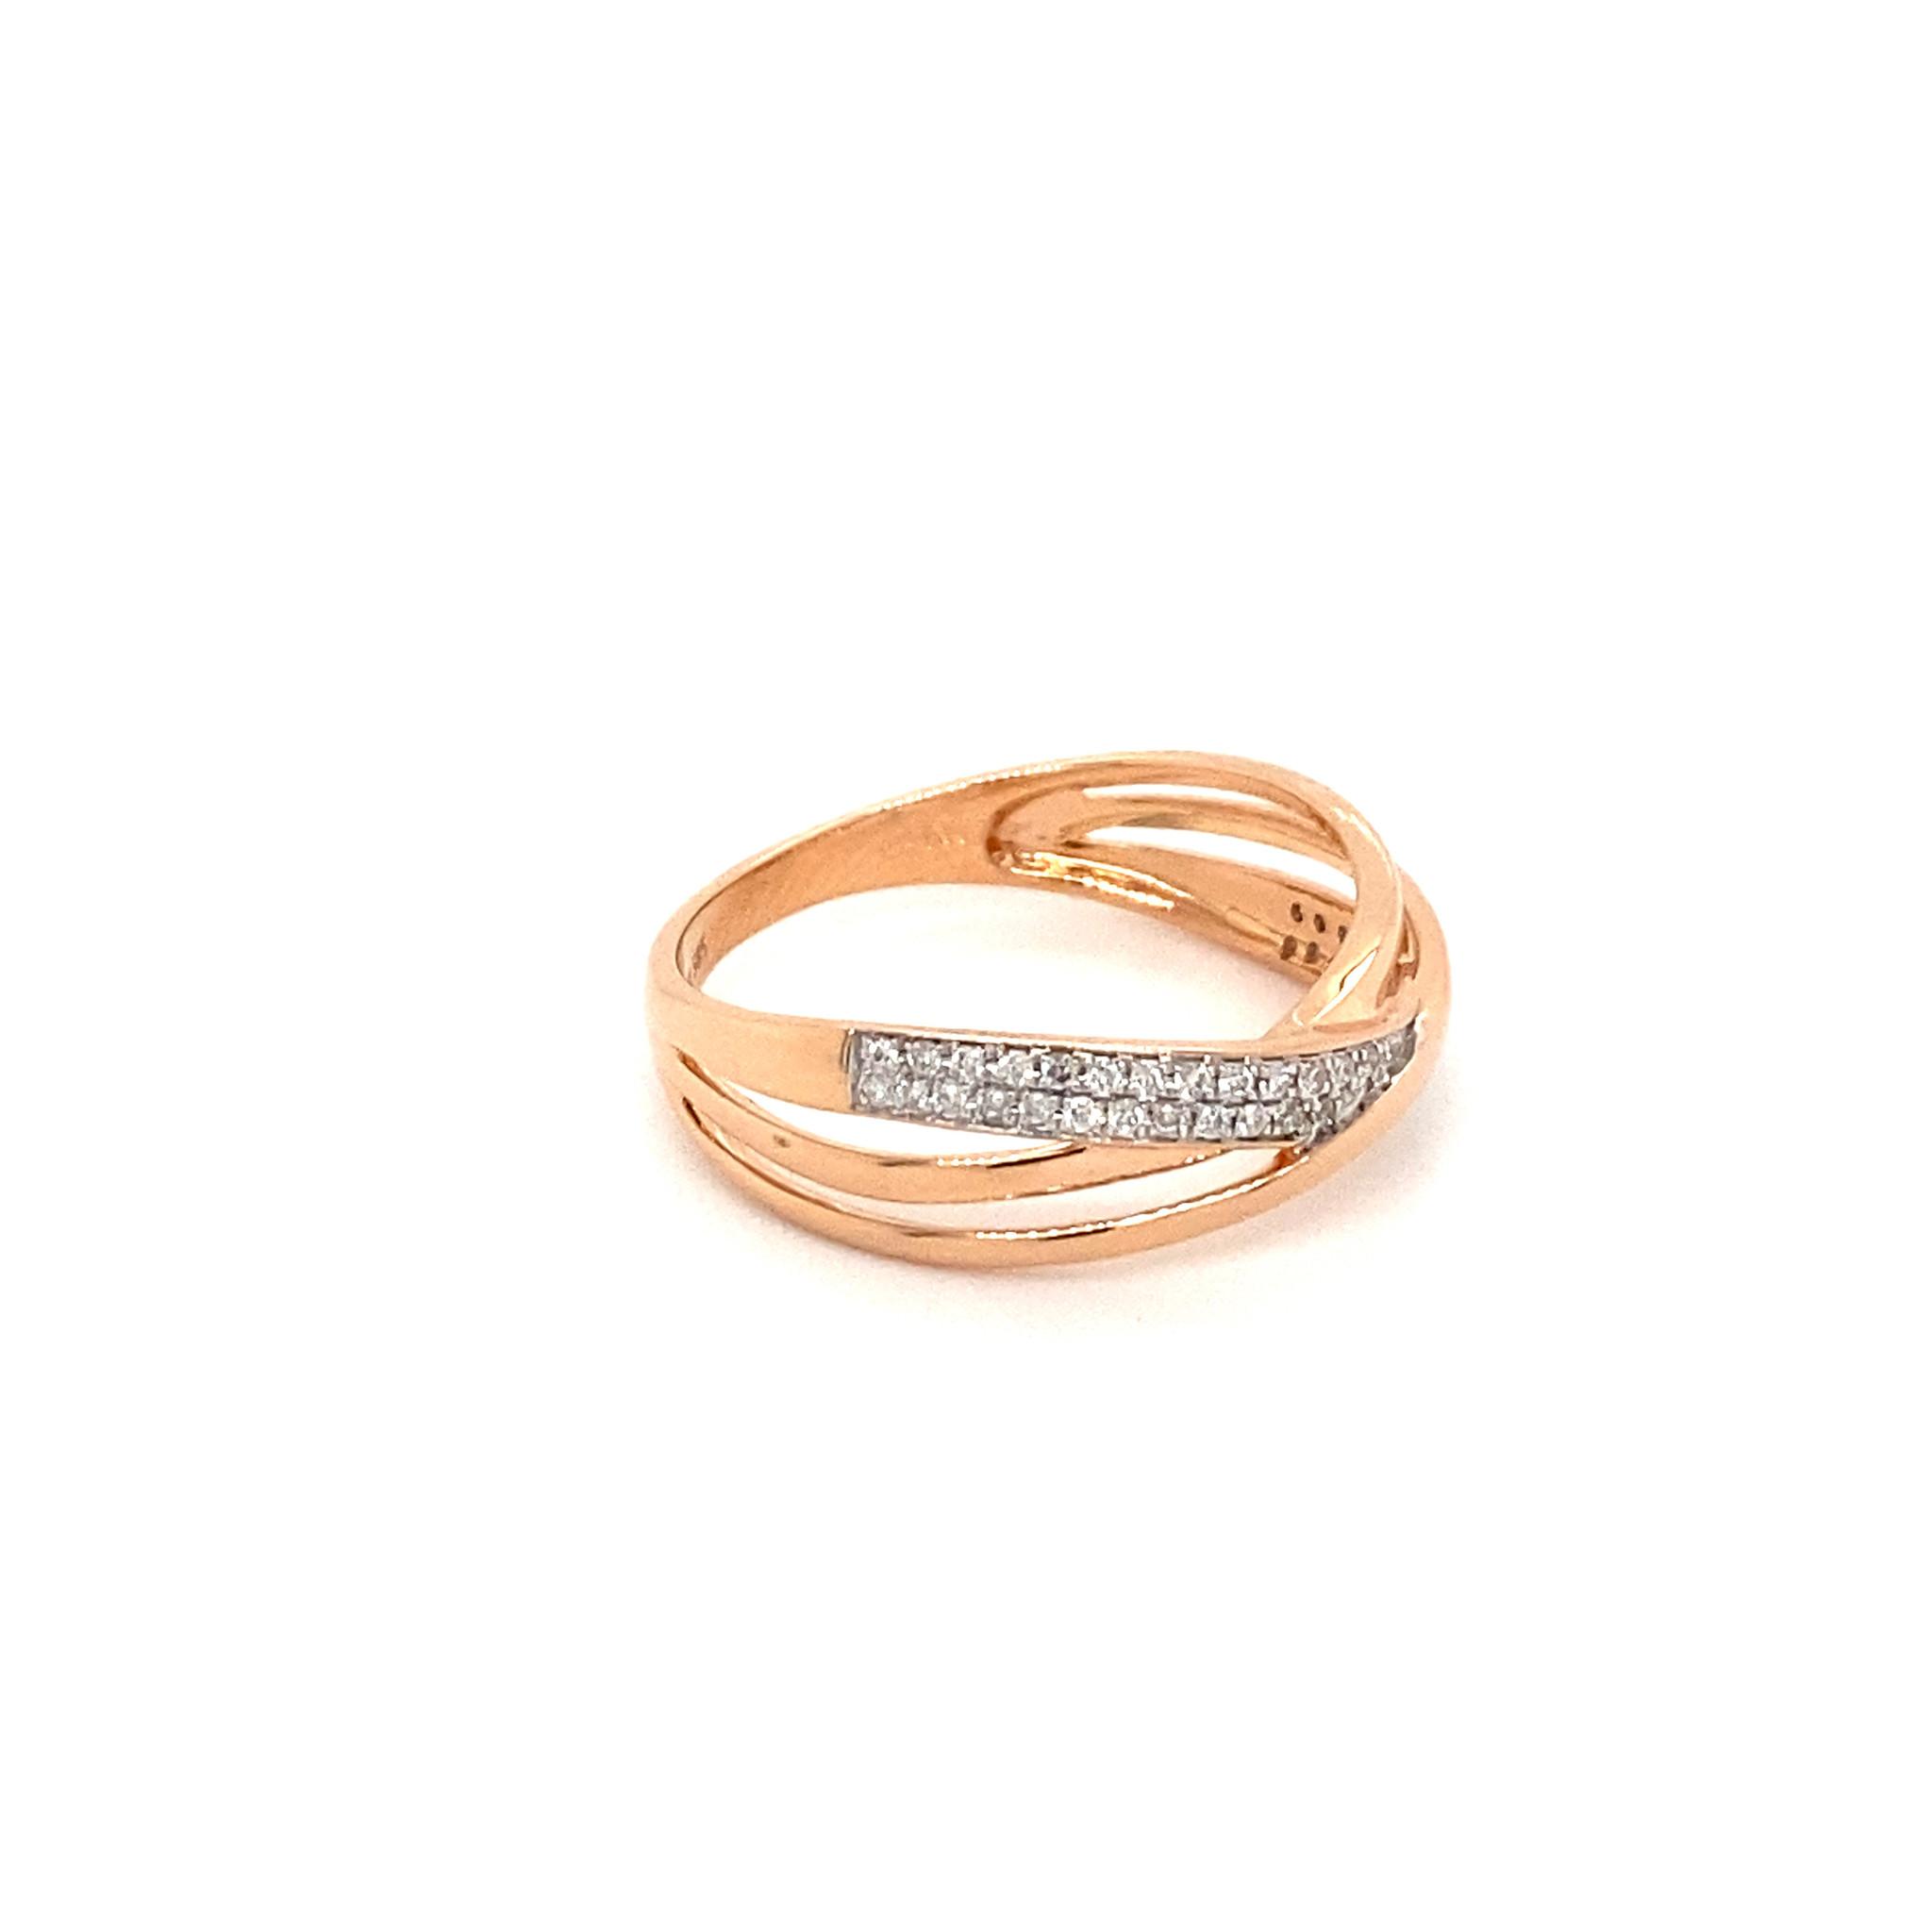 Private Label CvdK Private Label CvdK 14 krt. roségouden ring met diamanten